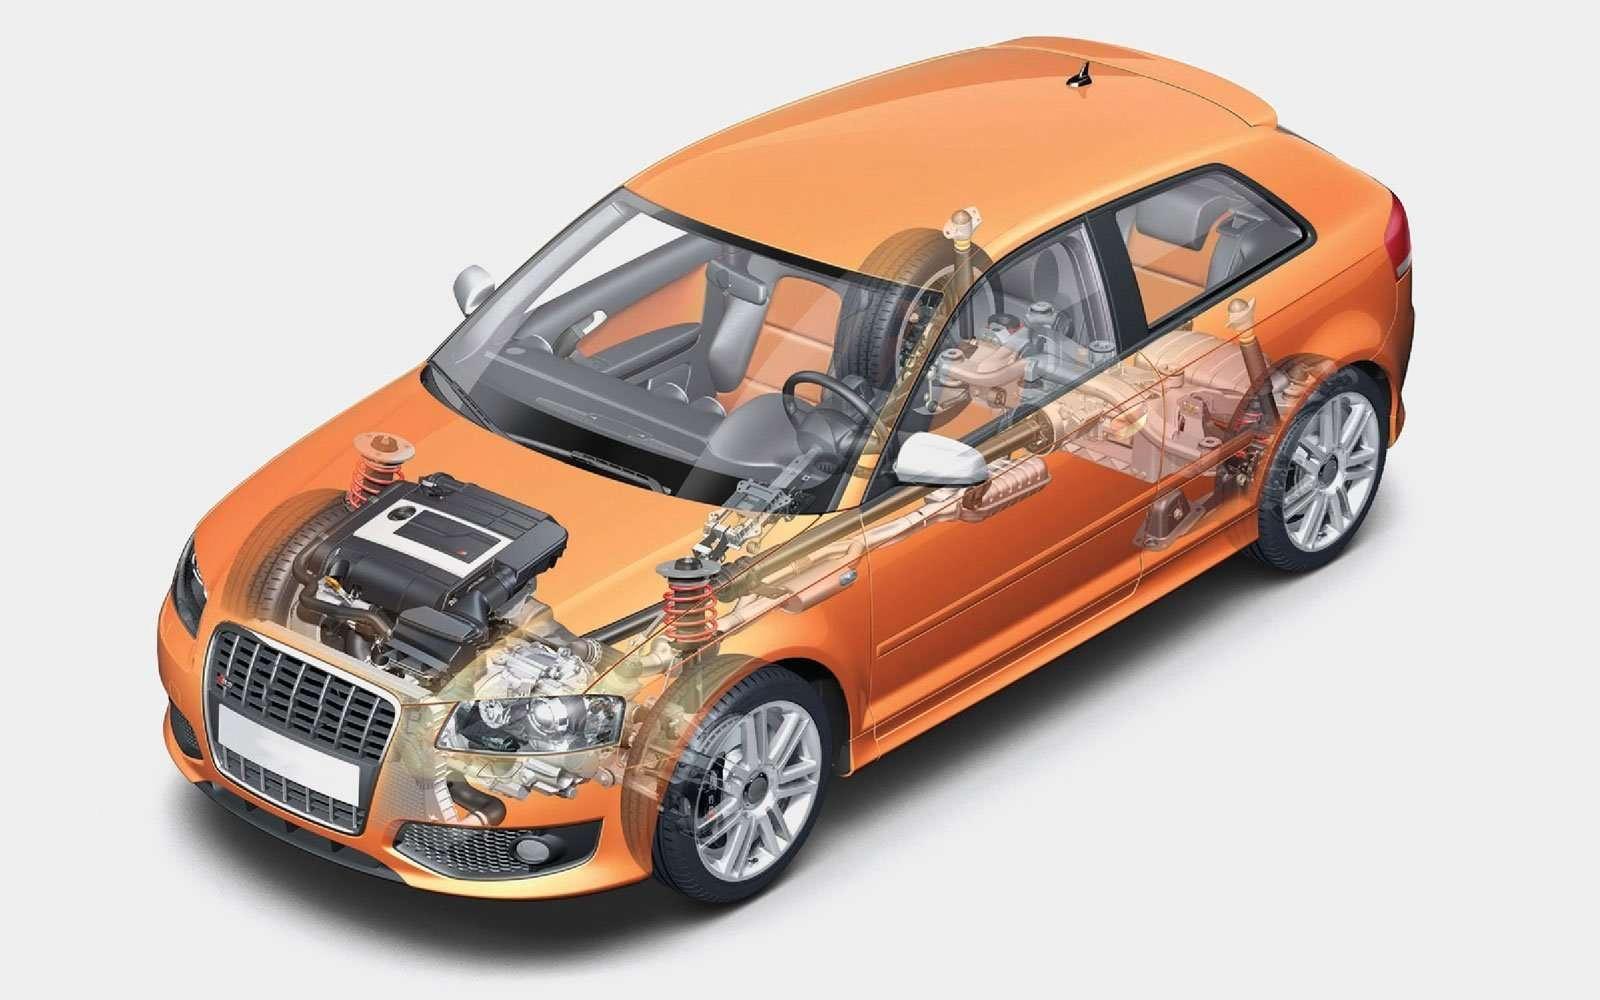 laser marking solution in automotive